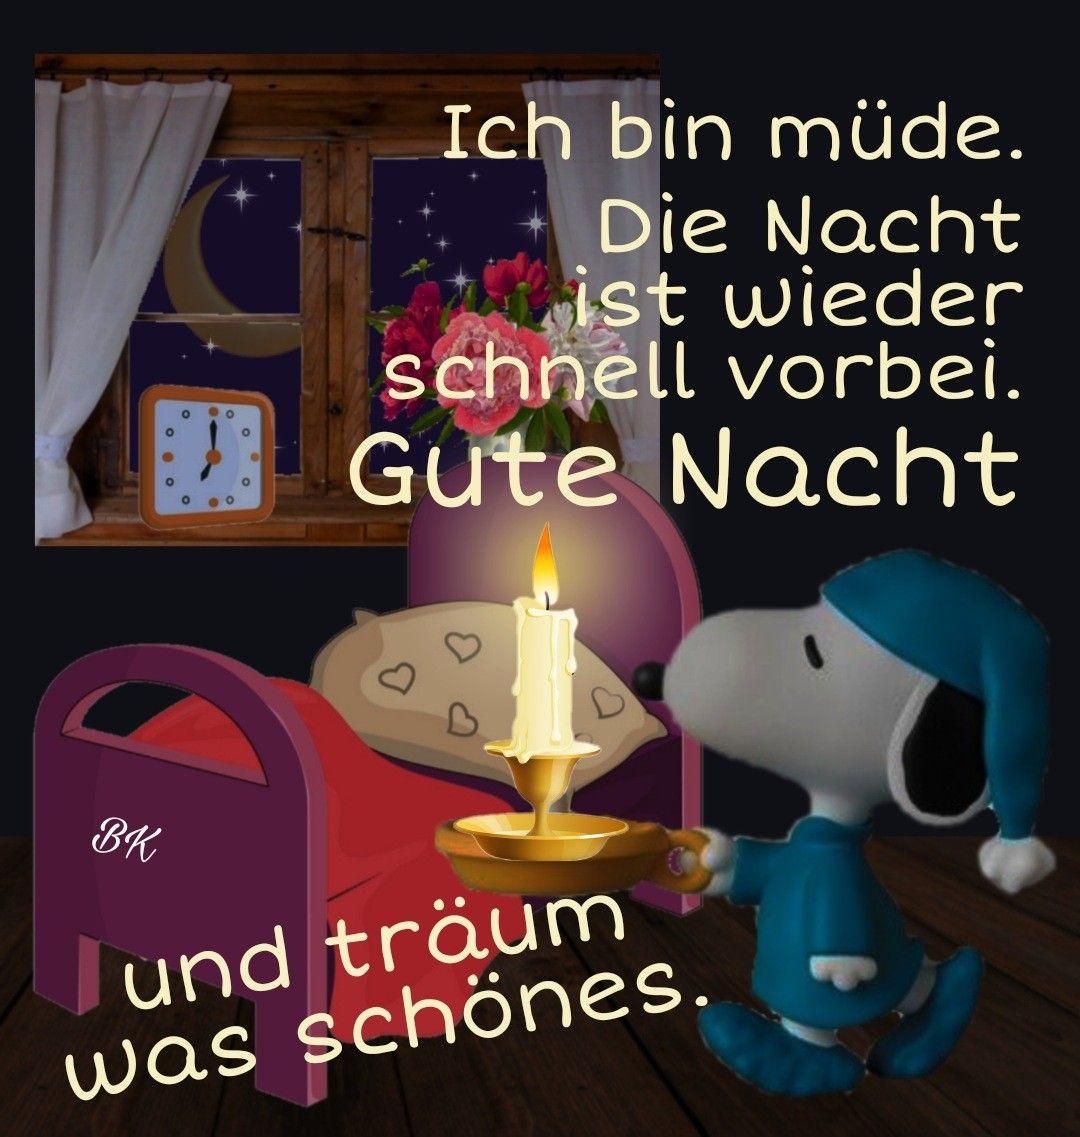 Gute Nacht Gute Nacht Nacht Gute Nacht Grüße